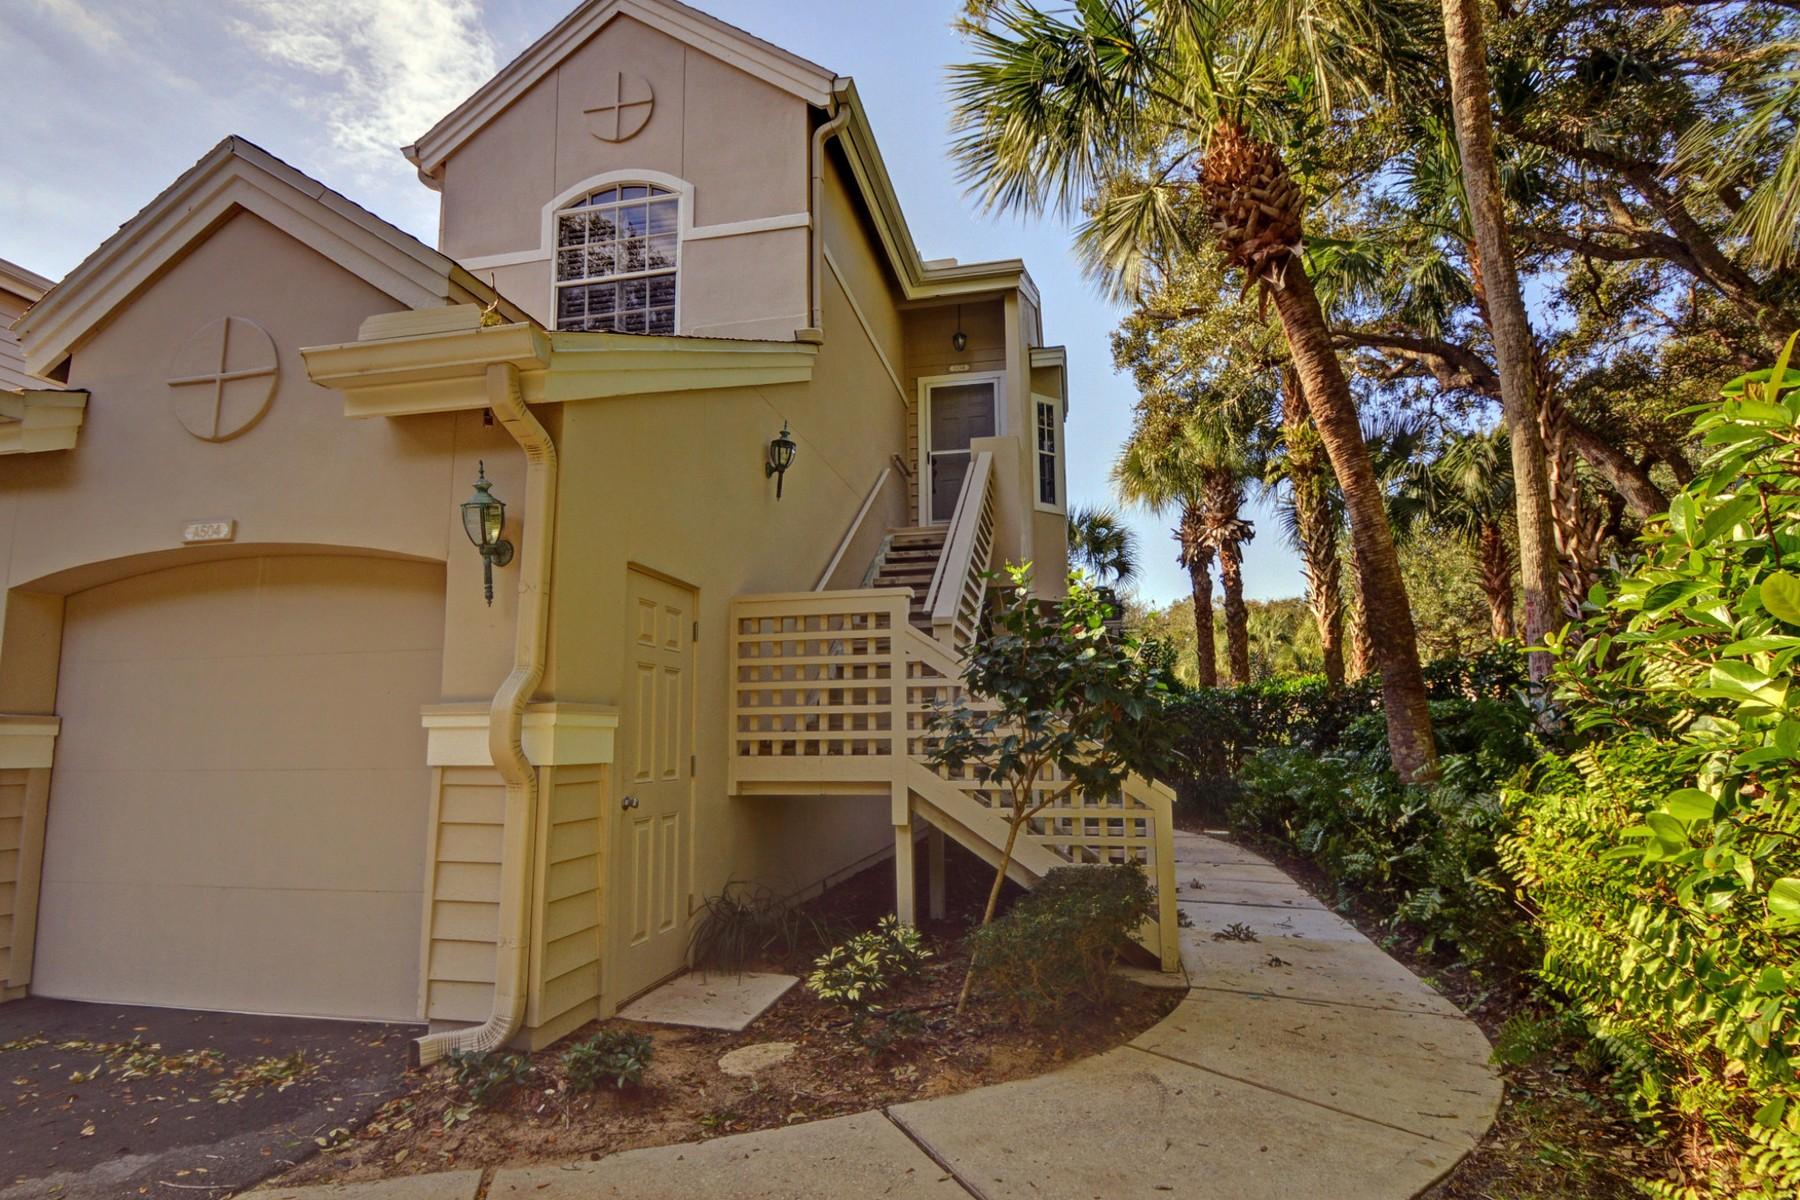 Condominium for Sale at Elegant Sea Oaks Condo 1415 Winding Oaks Circle #A504 Vero Beach, Florida, 32963 United States